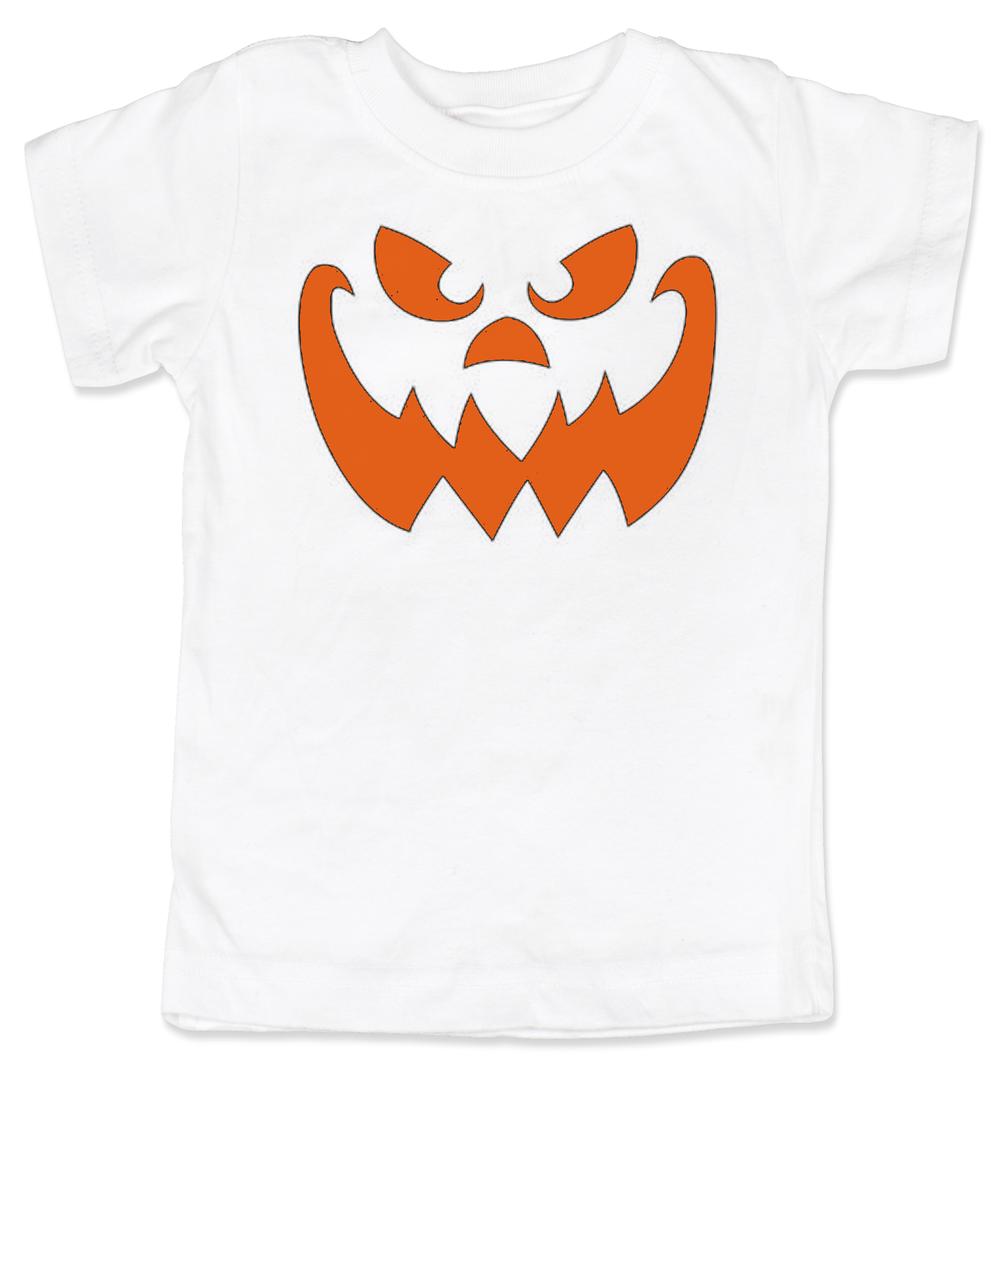 74d21965 Halloween toddler shirt, Jack-O-toddler shirt, Jack-o-lantern